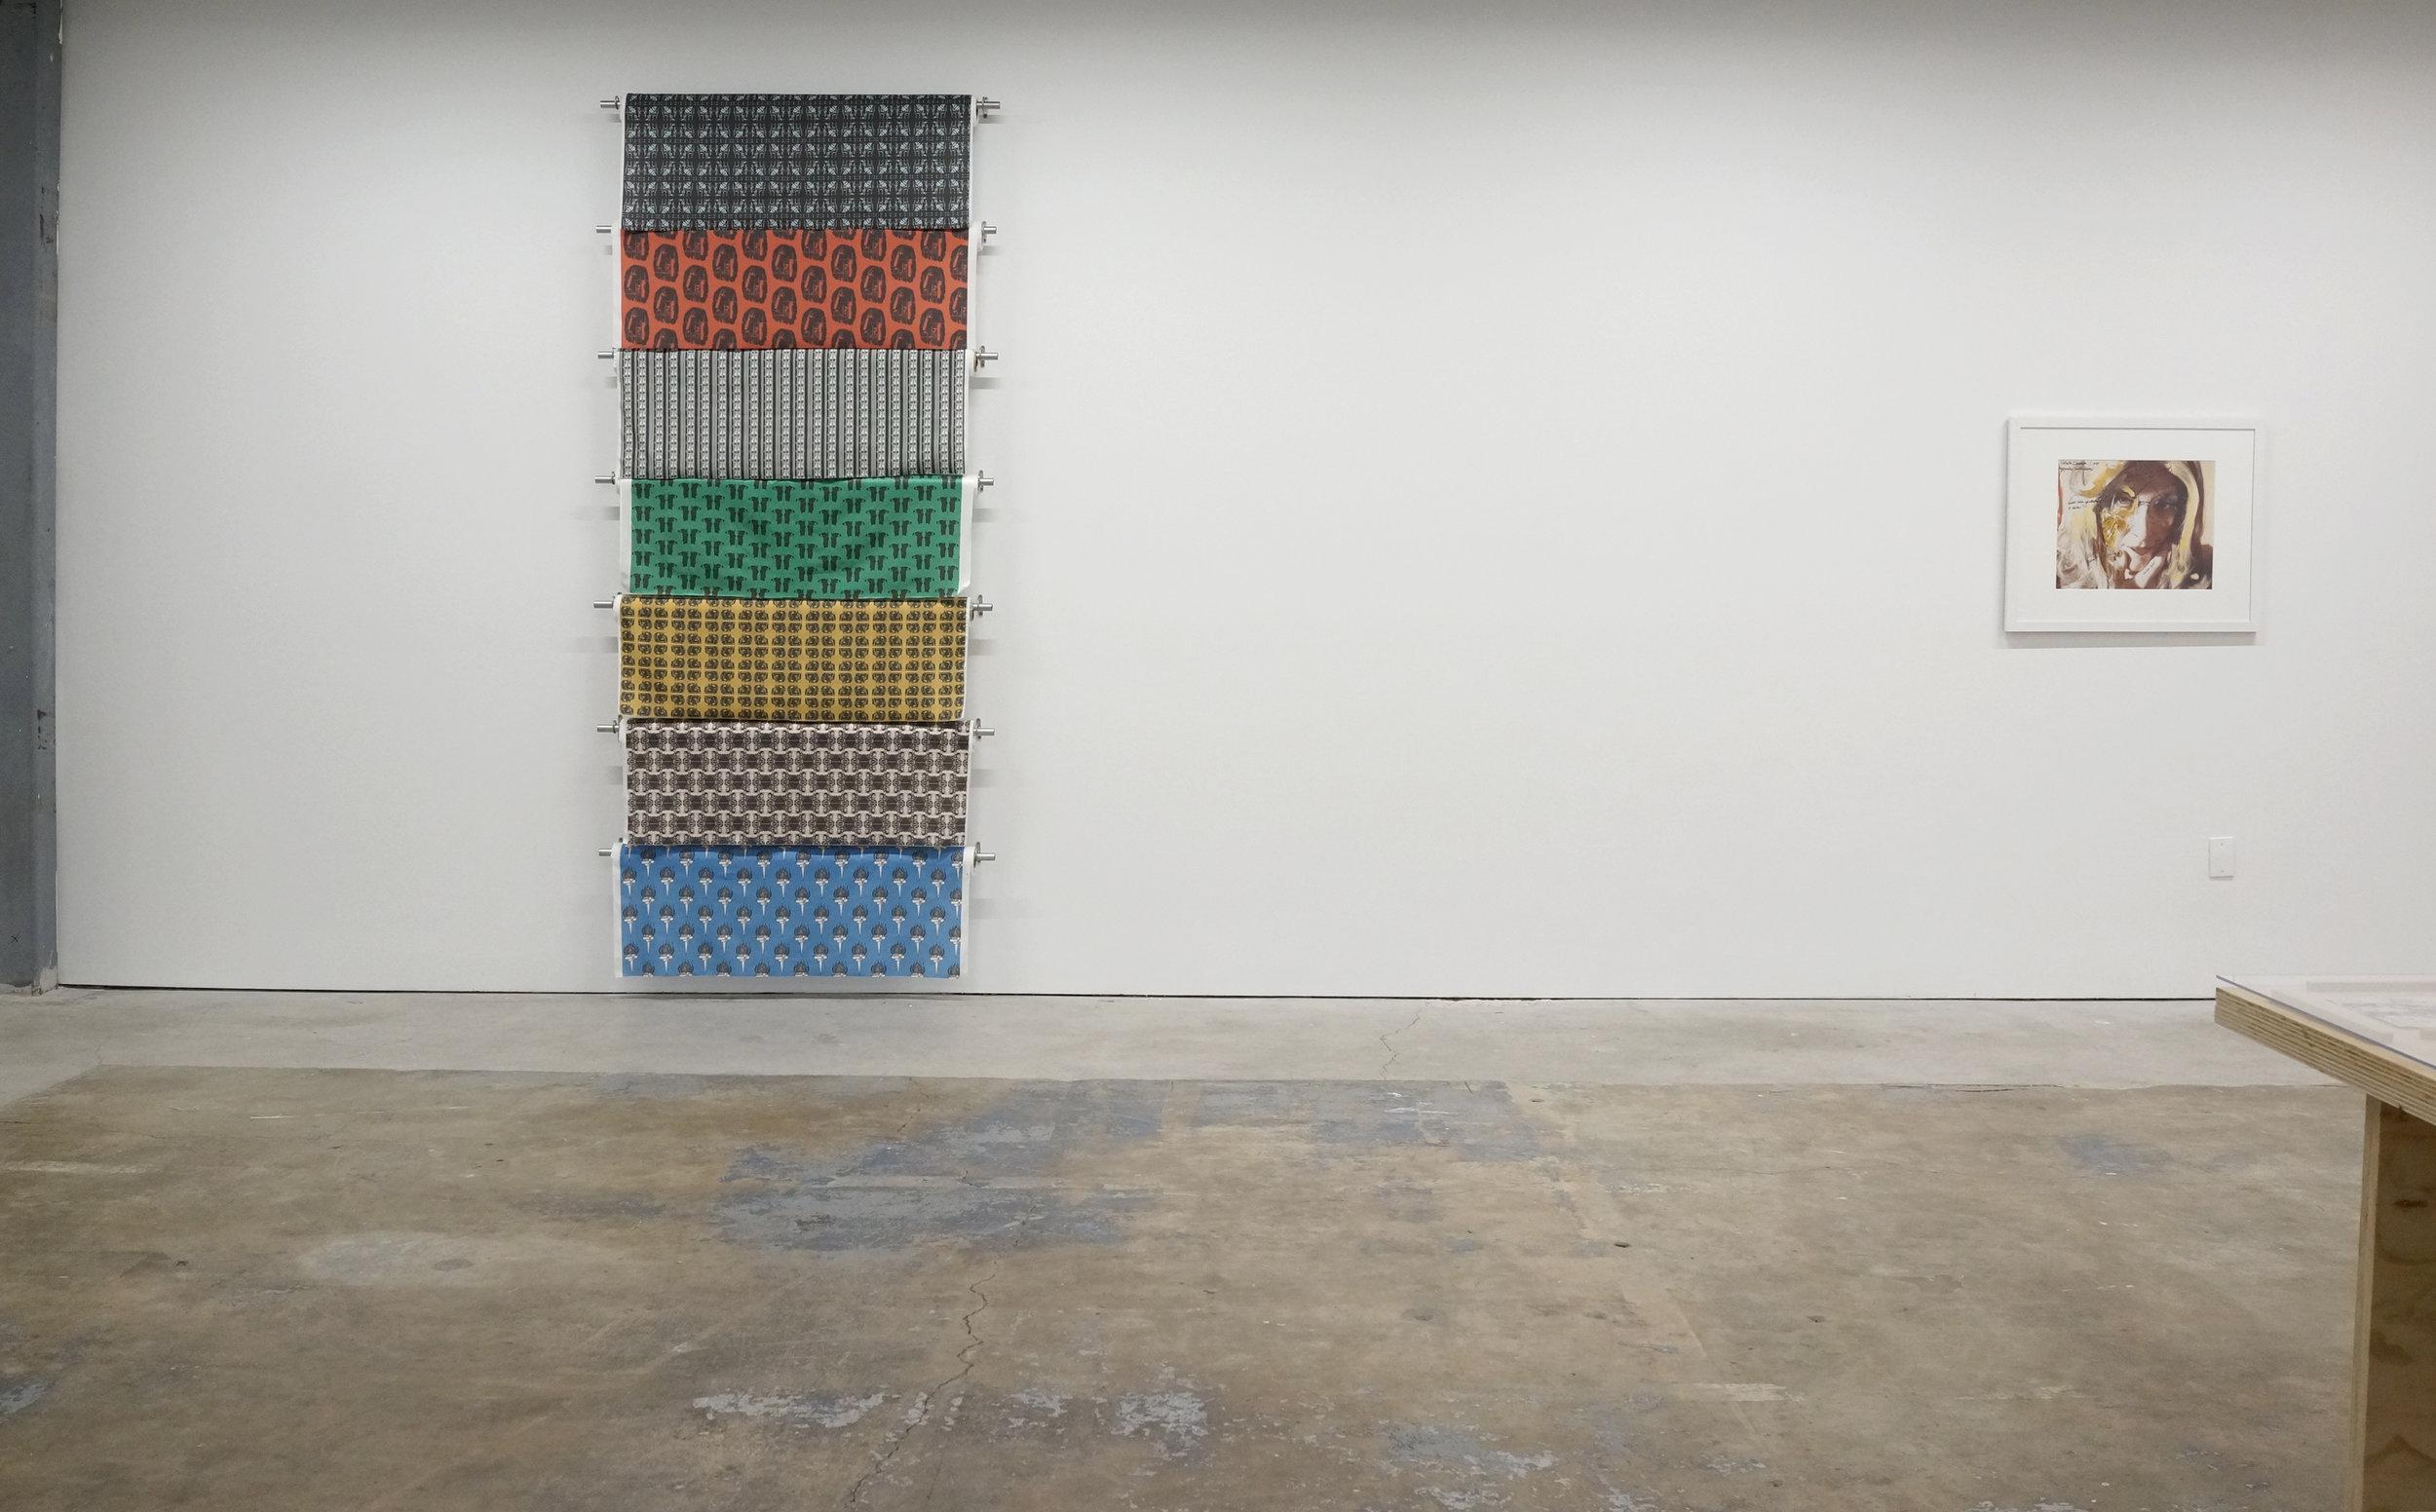 Installation view, L — Taraneh Hemami, R — Lynn Hershman Leeson